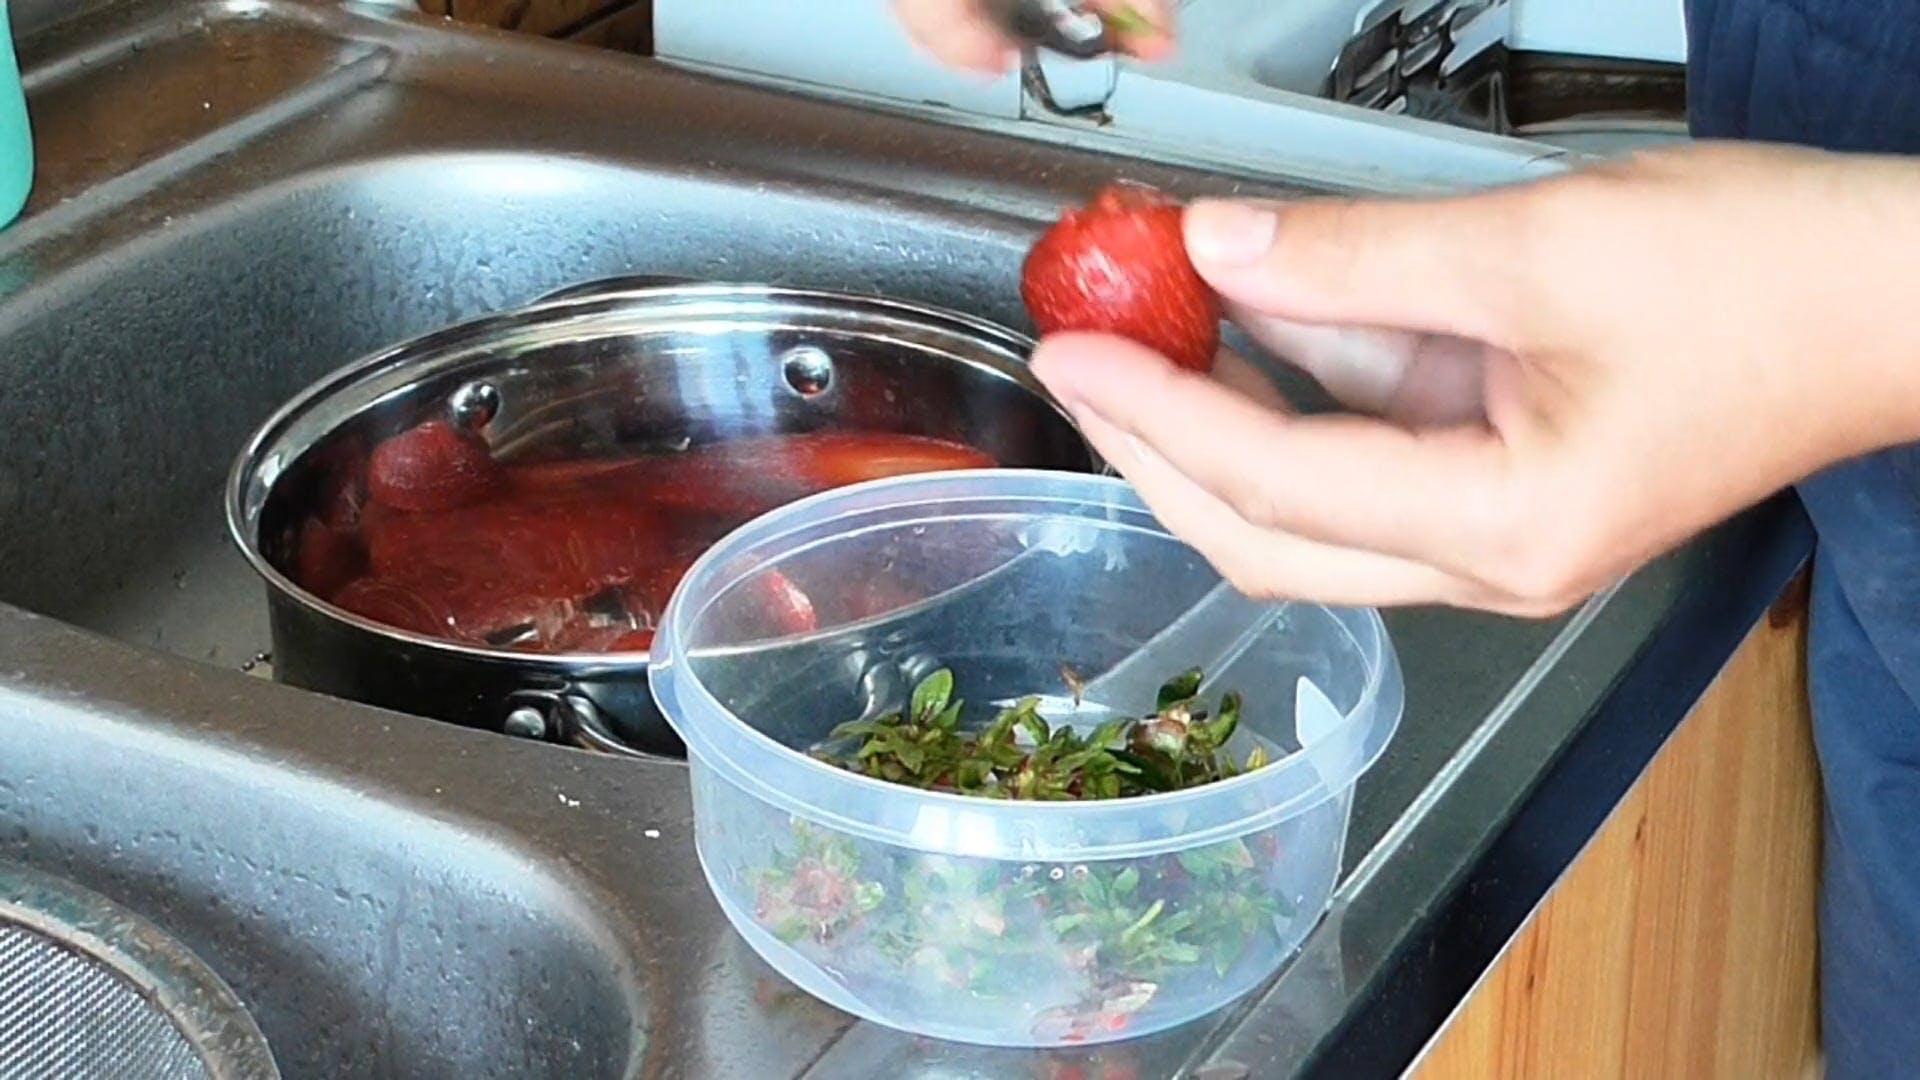 Removing Strawberry Stem